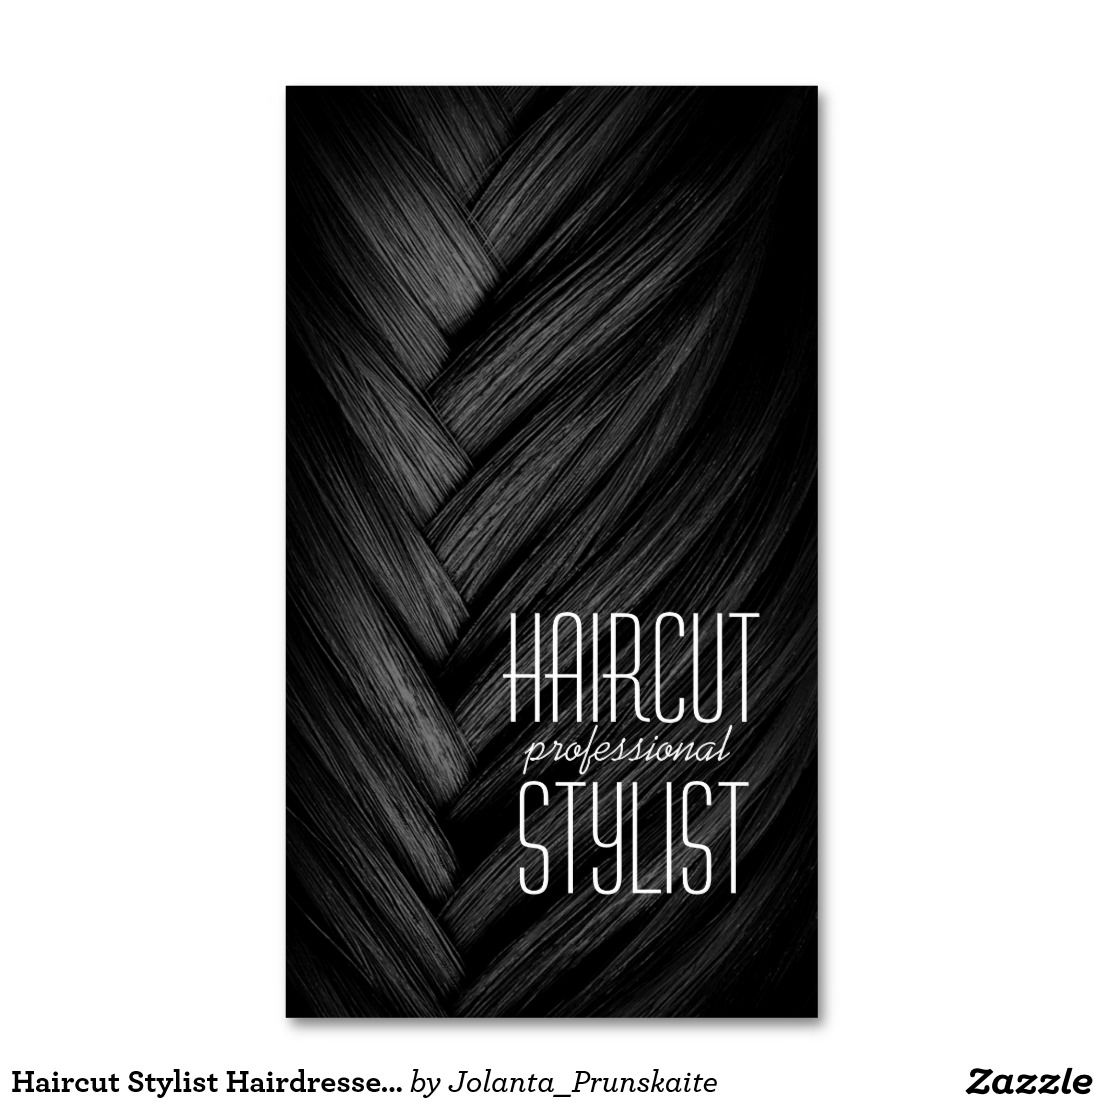 Haircut Stylist Hairdresser Black Business Card Haircut